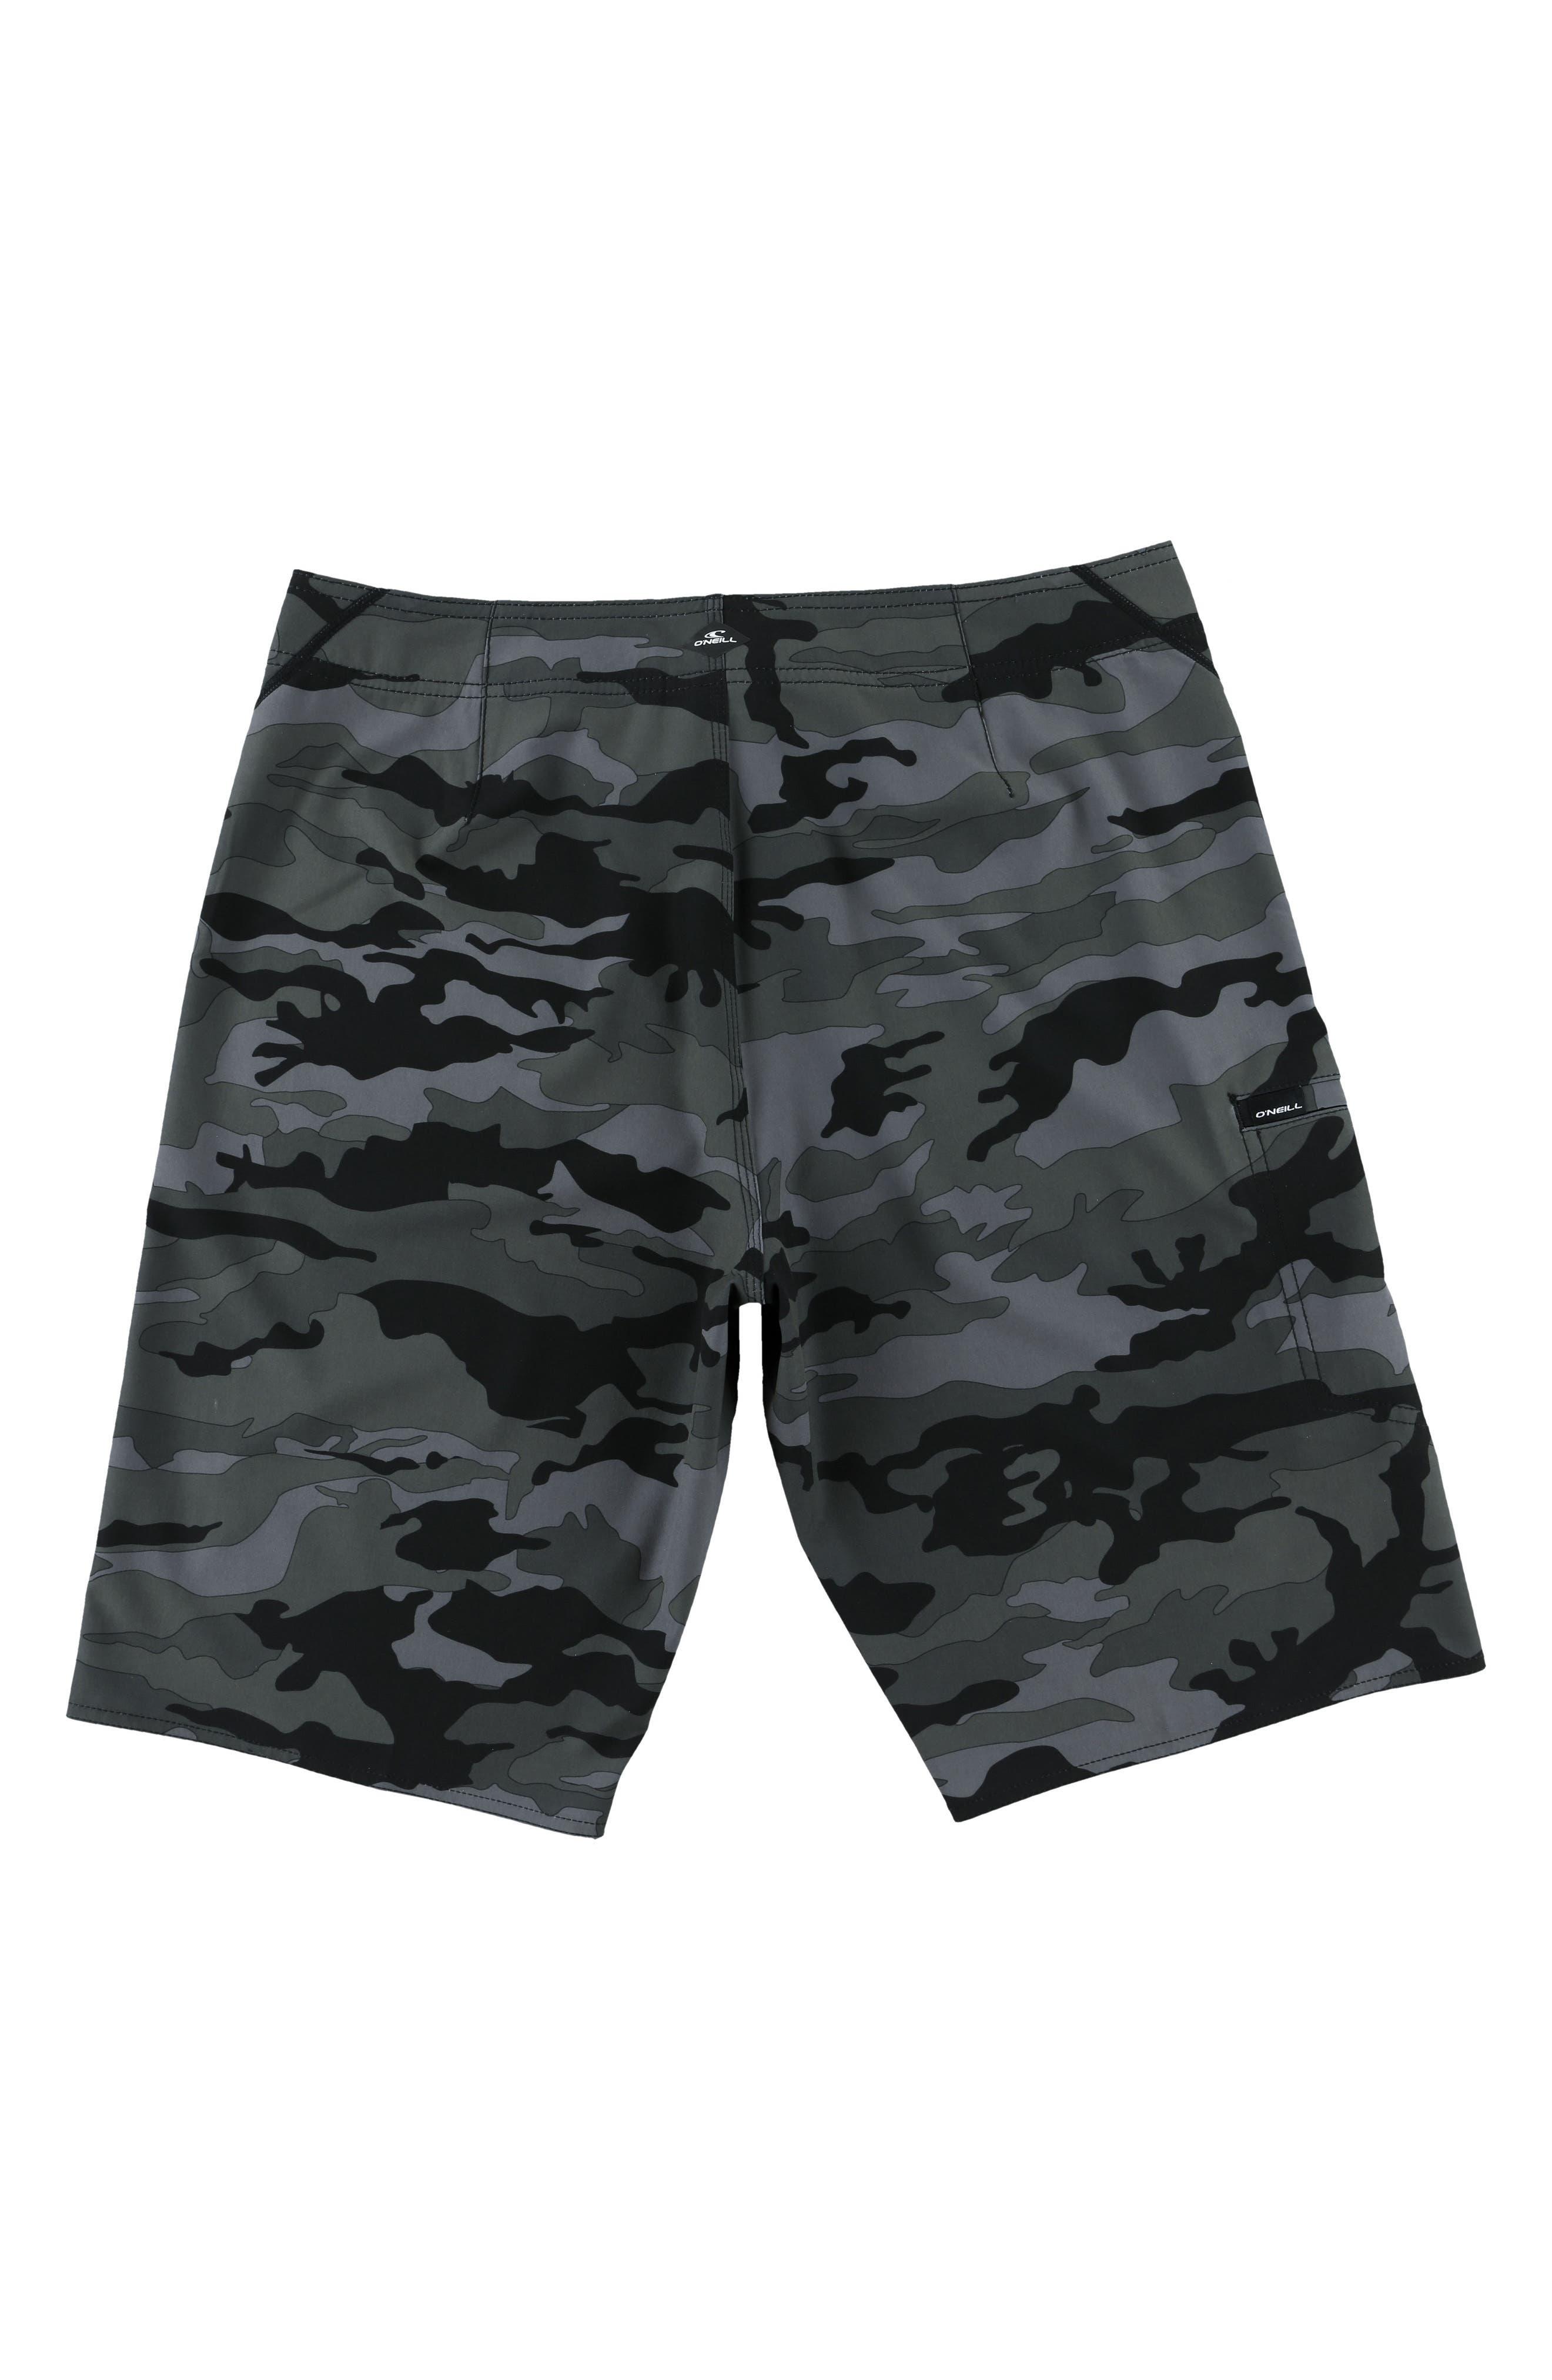 Hyperfreak S-Seam Stretch Board Shorts,                         Main,                         color,